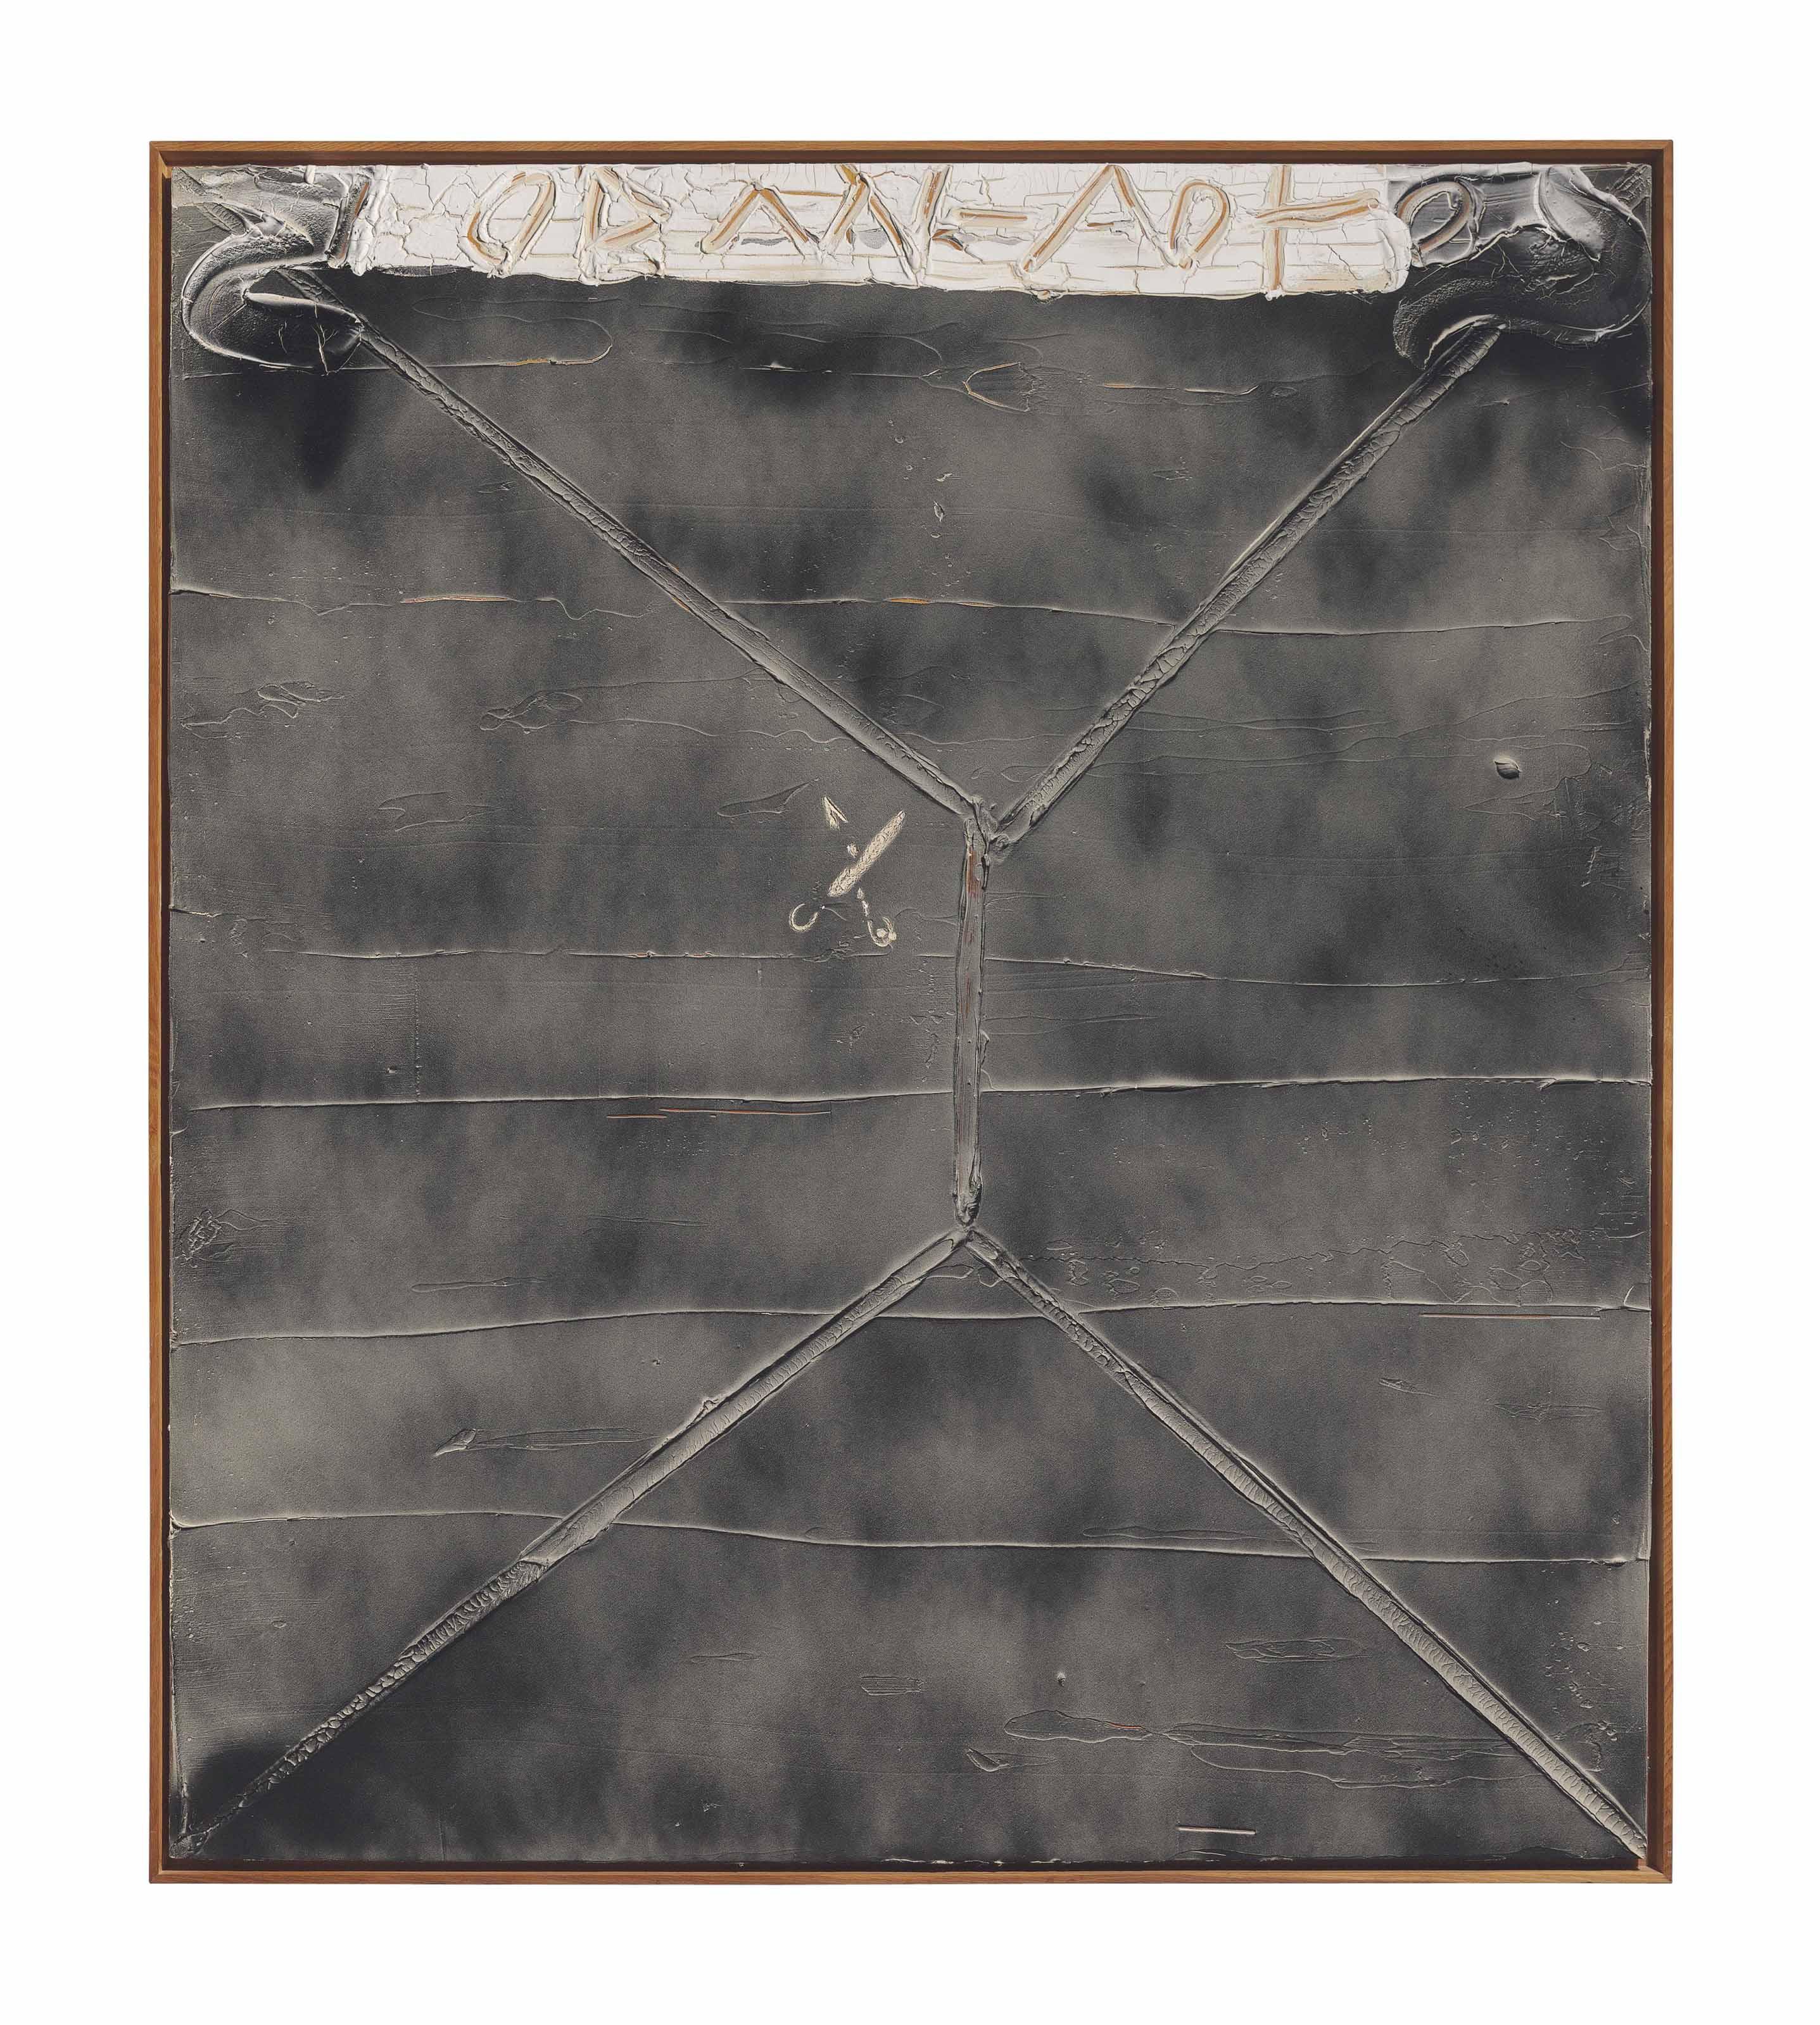 Antoni Tàpies (1923-2012)